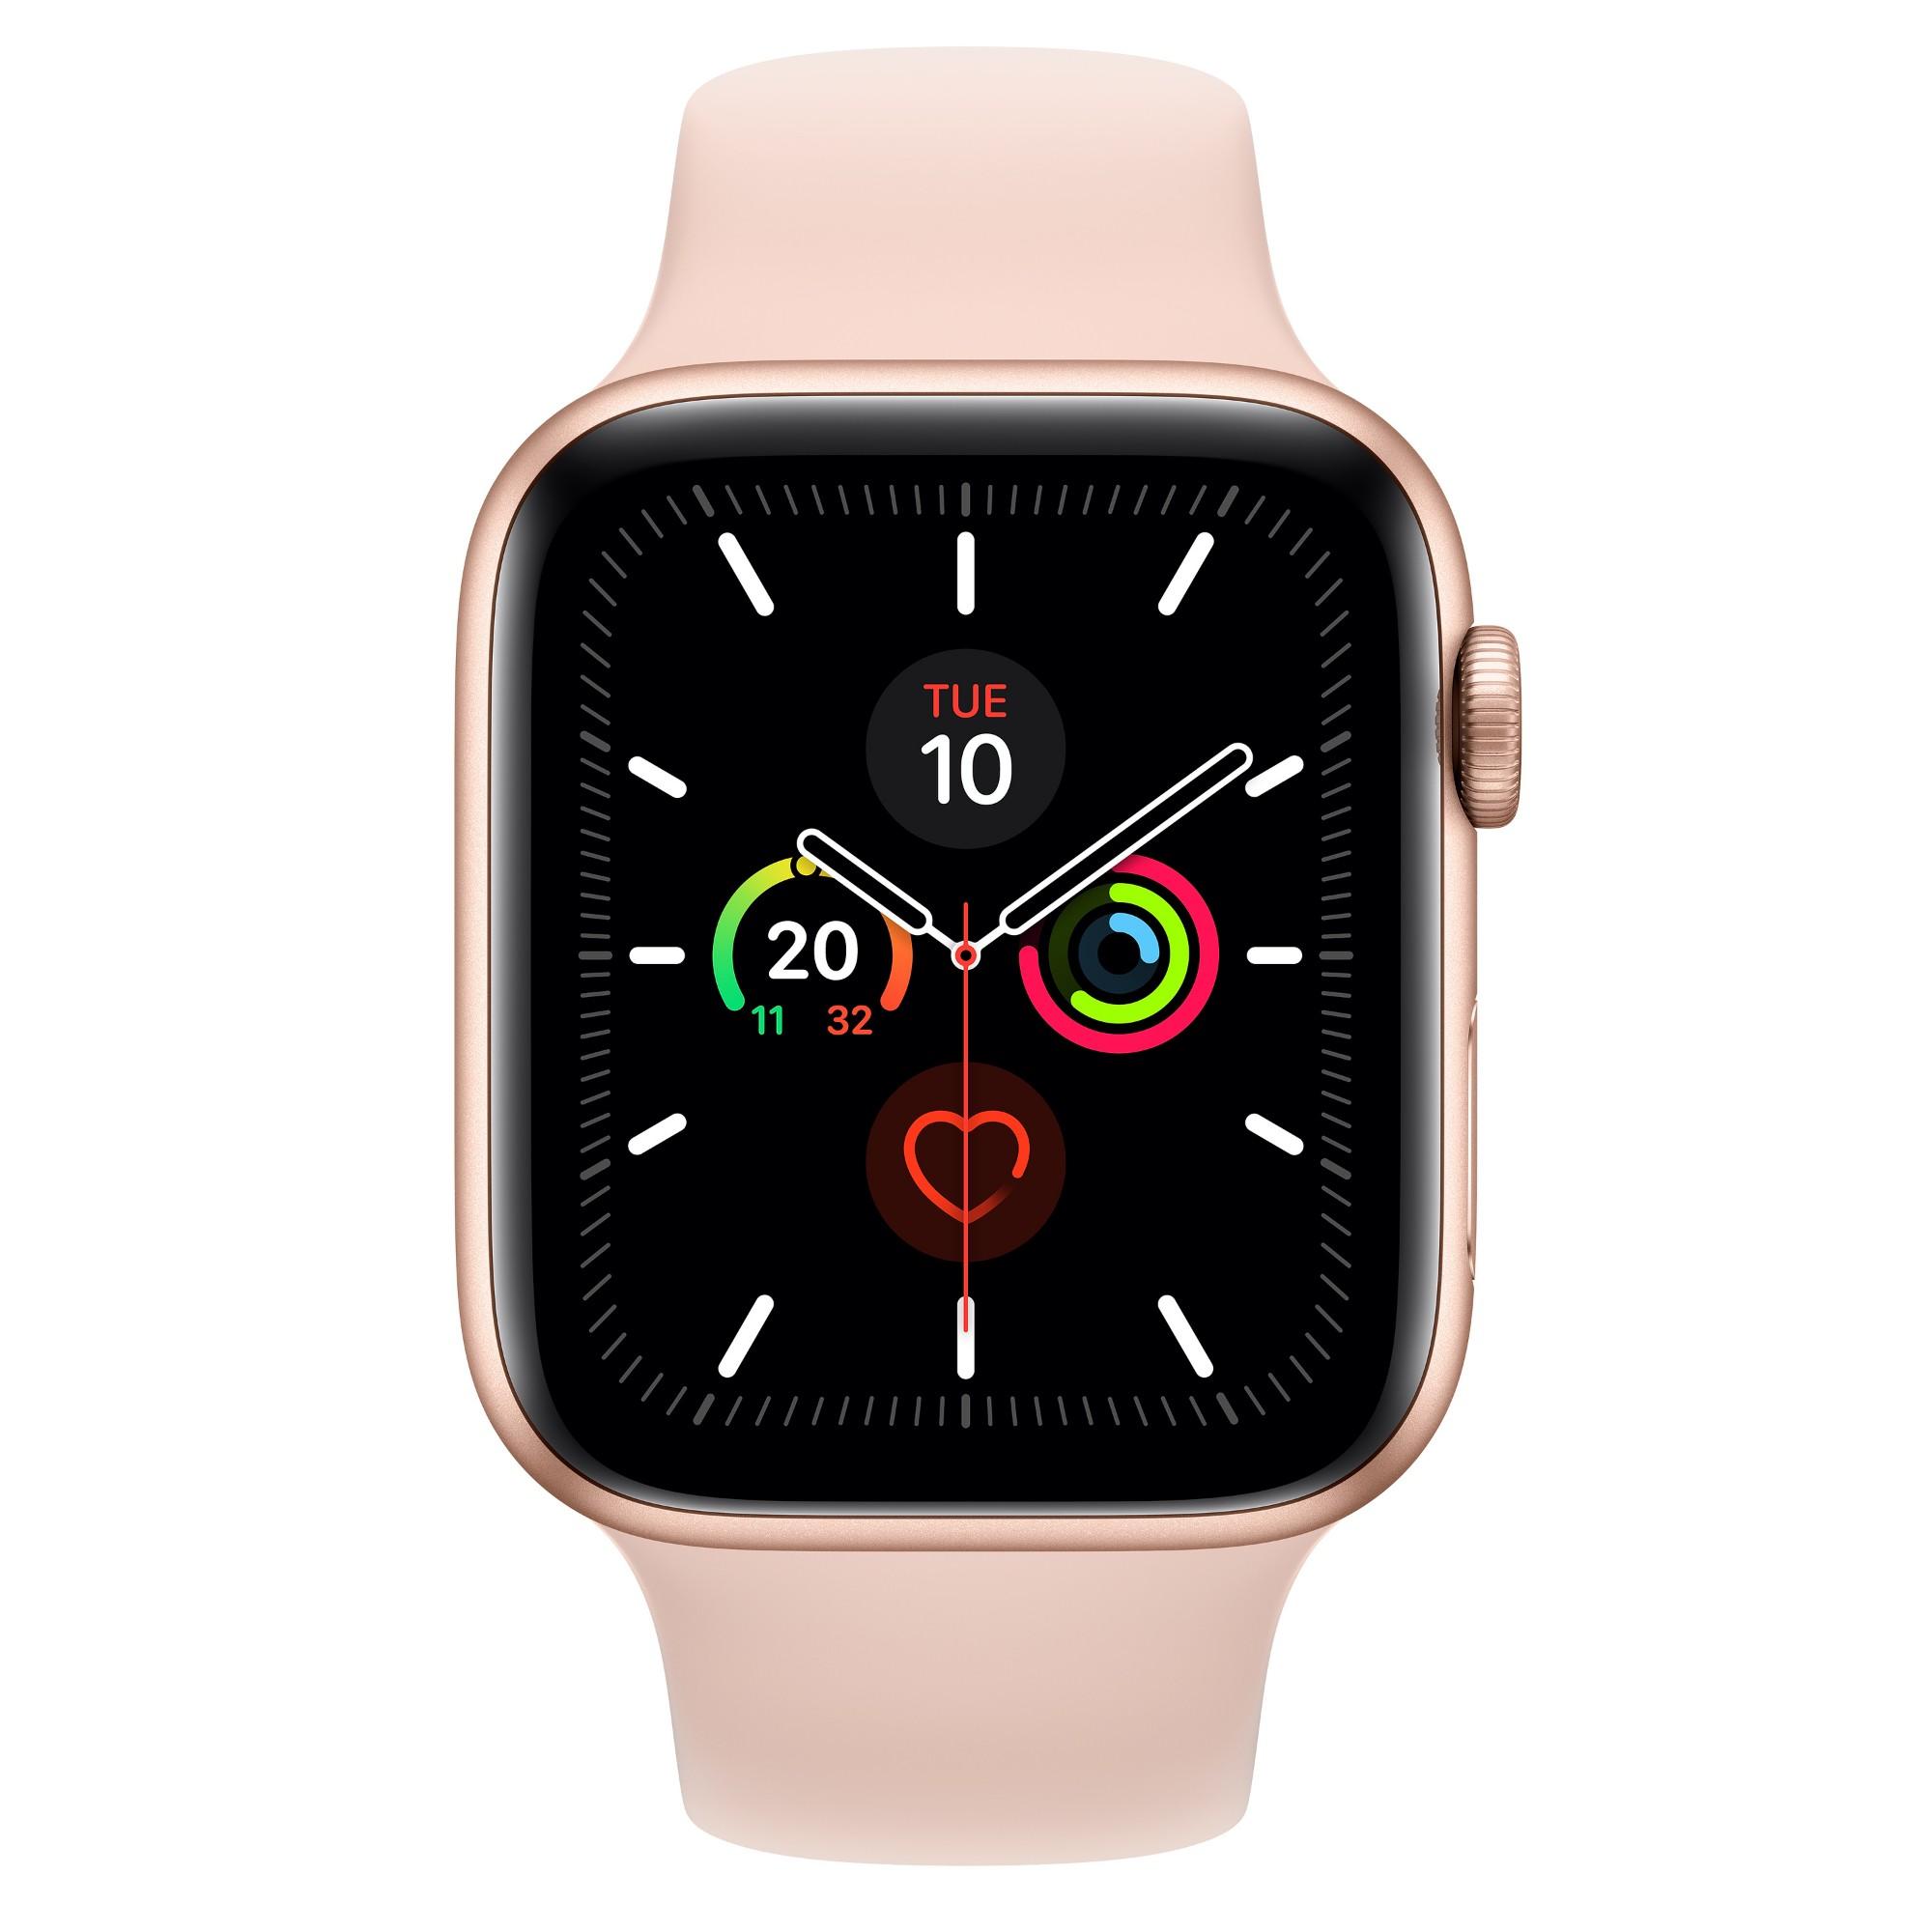 Apple Watch Series 5 smartwatch Gold OLED Cellular GPS satellite